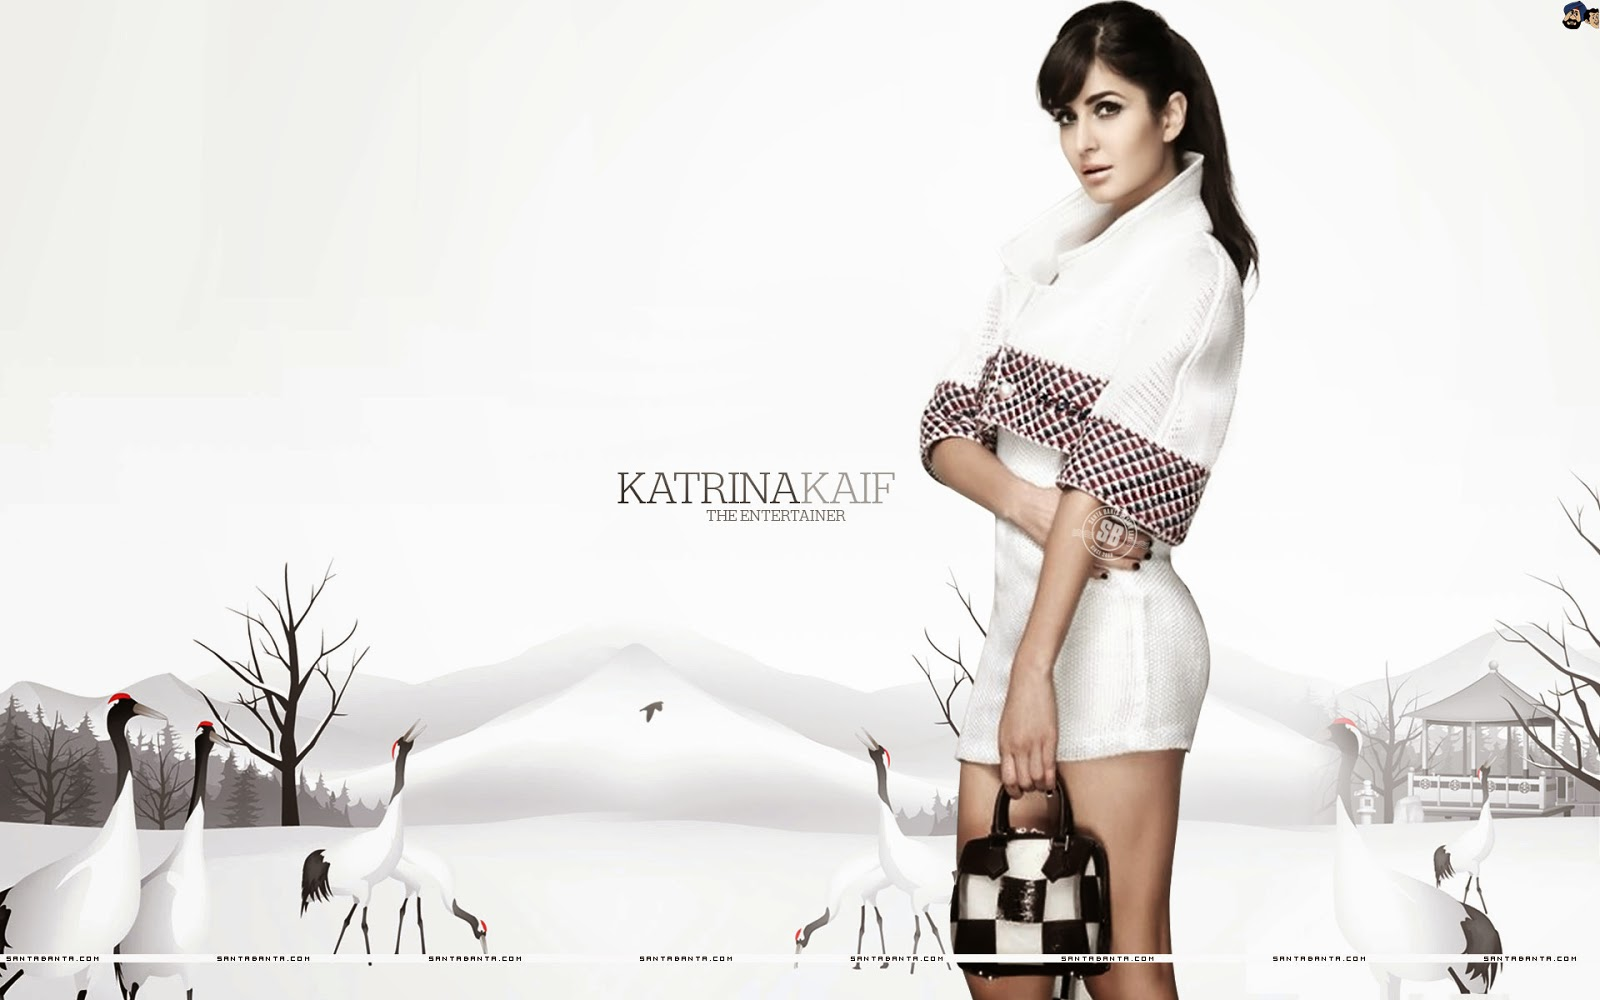 Katrina Kaif Seksi Wallpaper 13